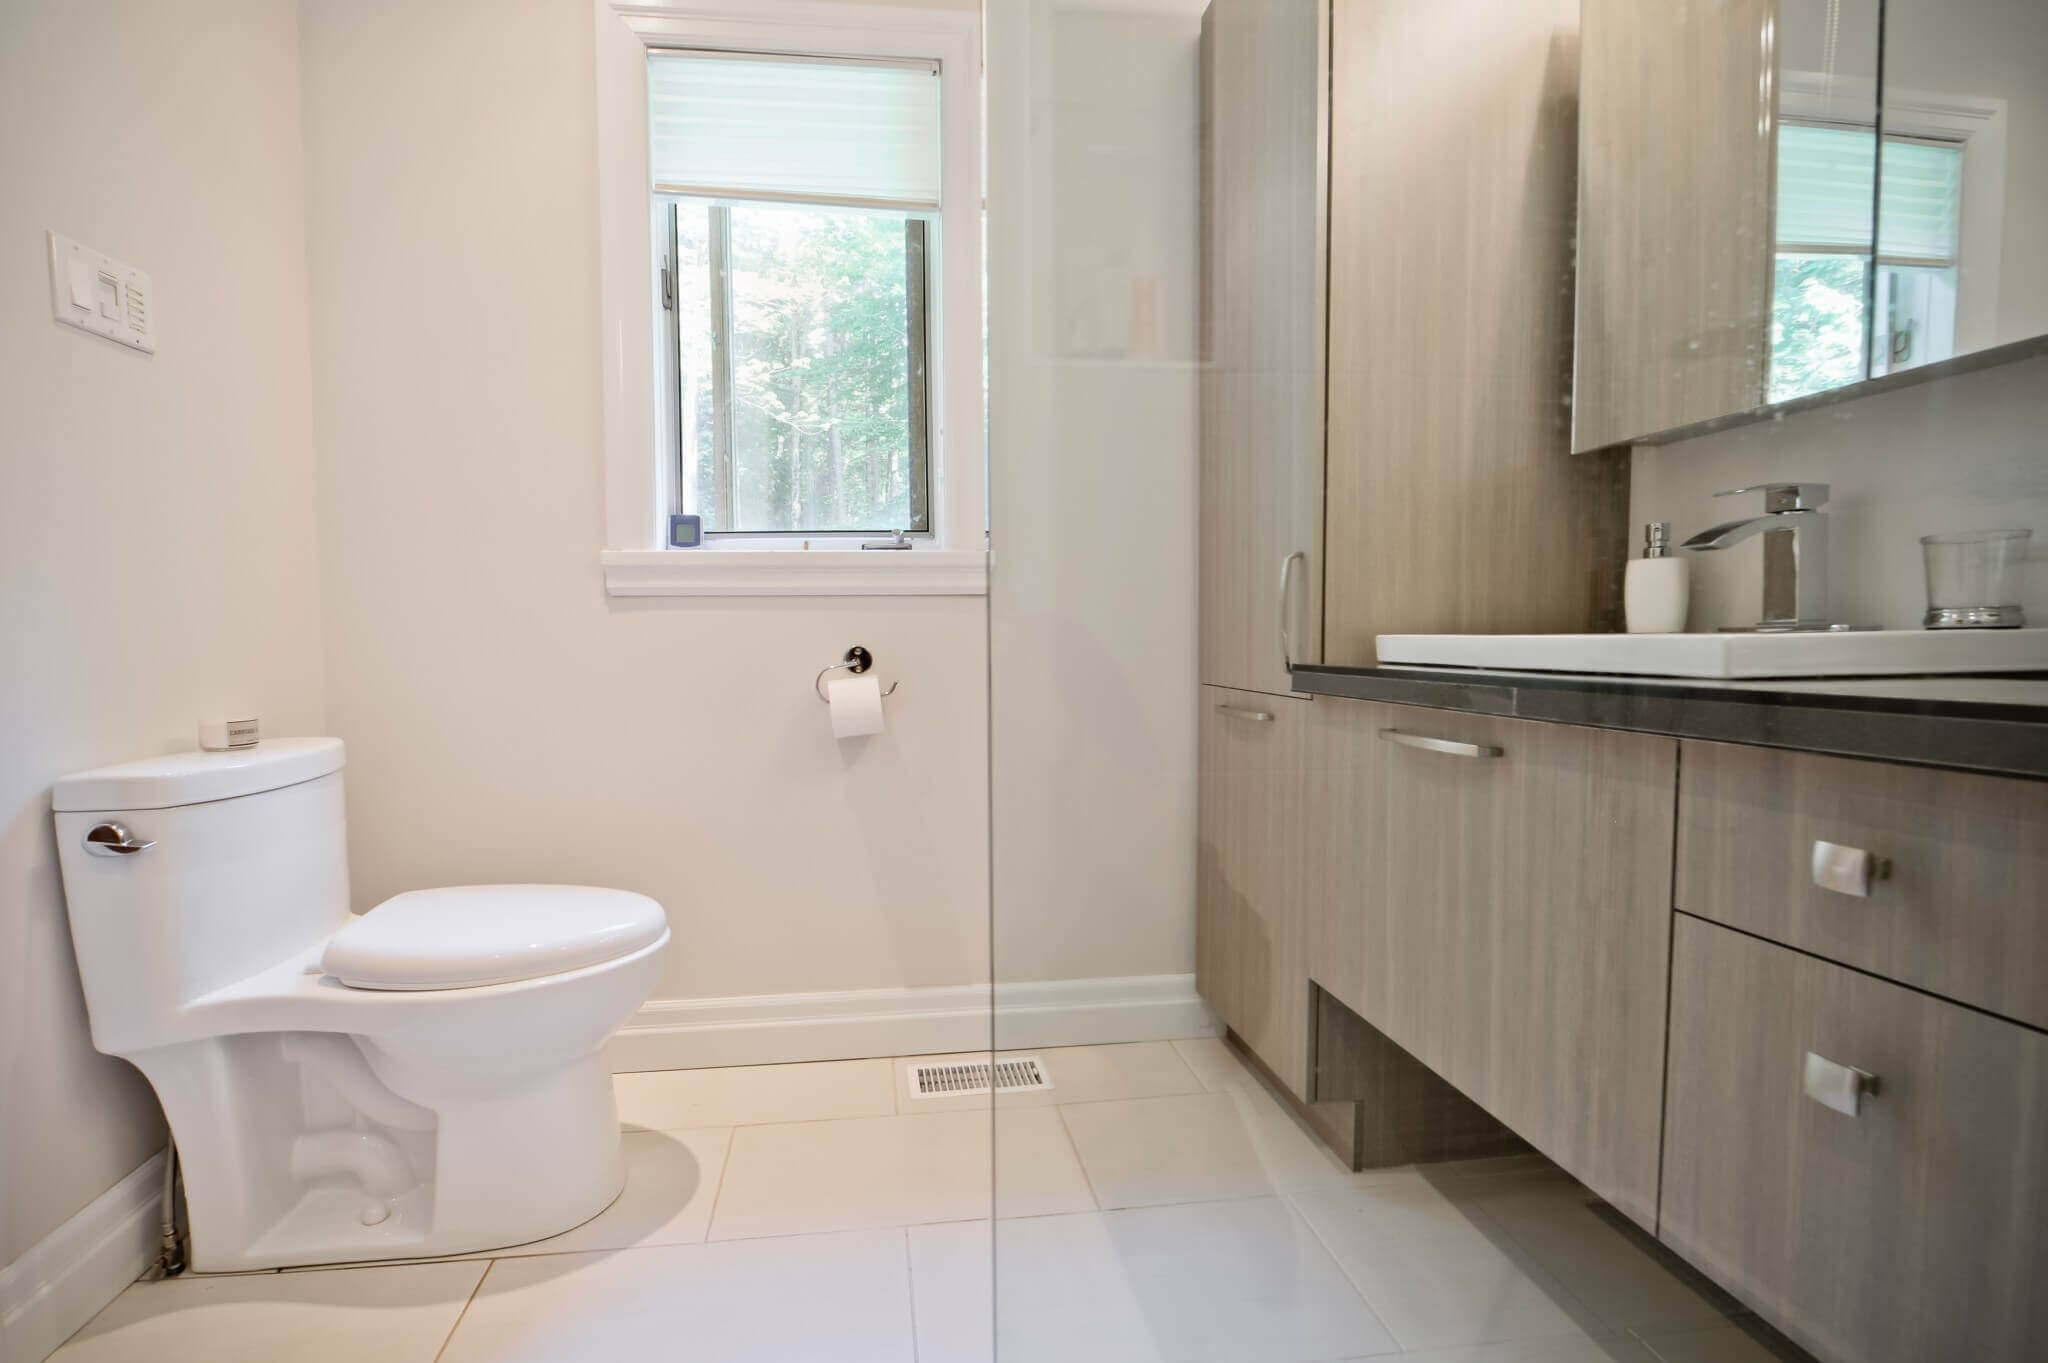 toilette de salle de bain